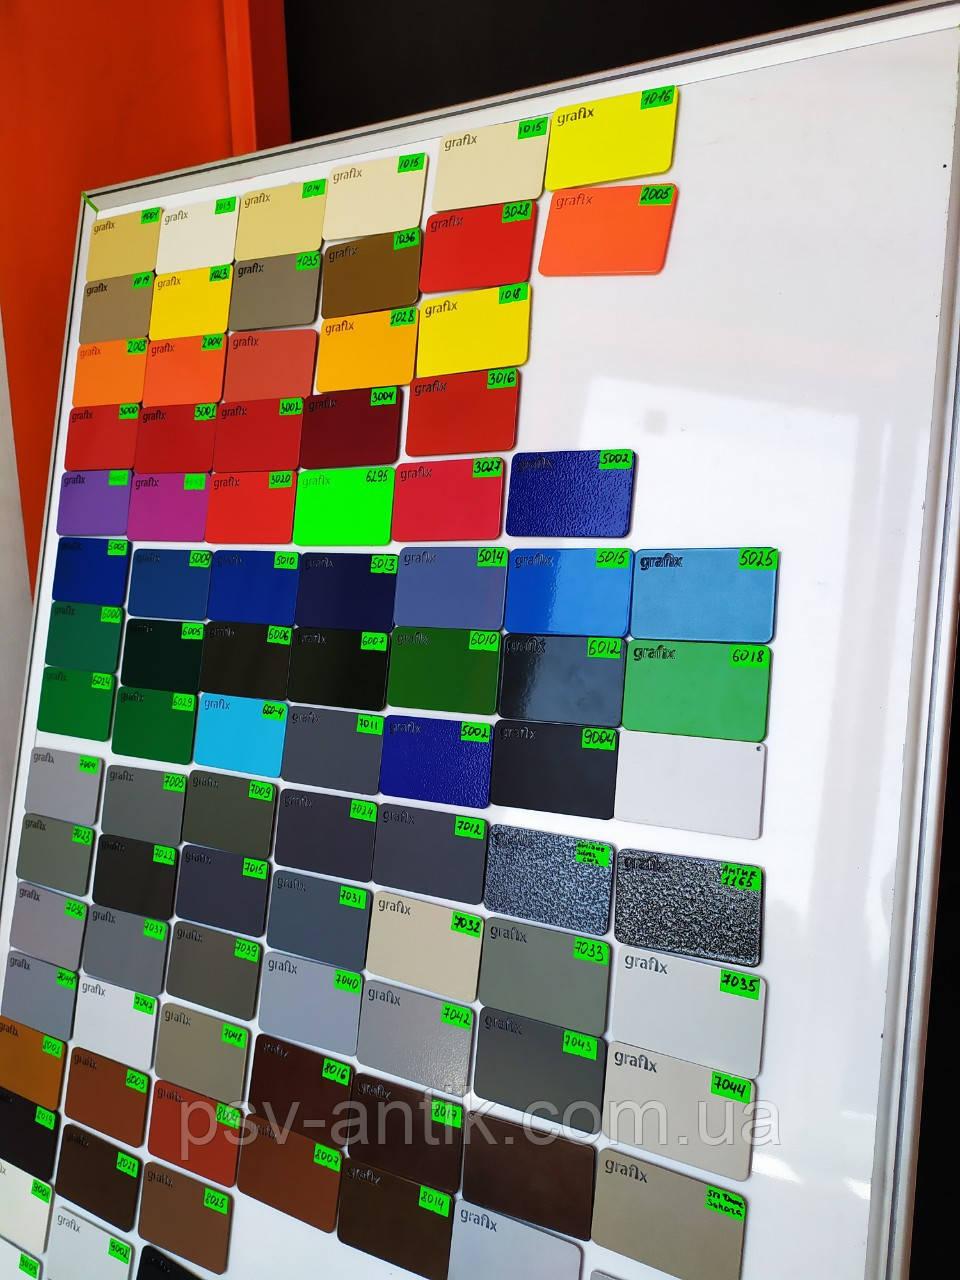 Порошковая краска глянцевая, полиэфирная, архитектурная, 8008